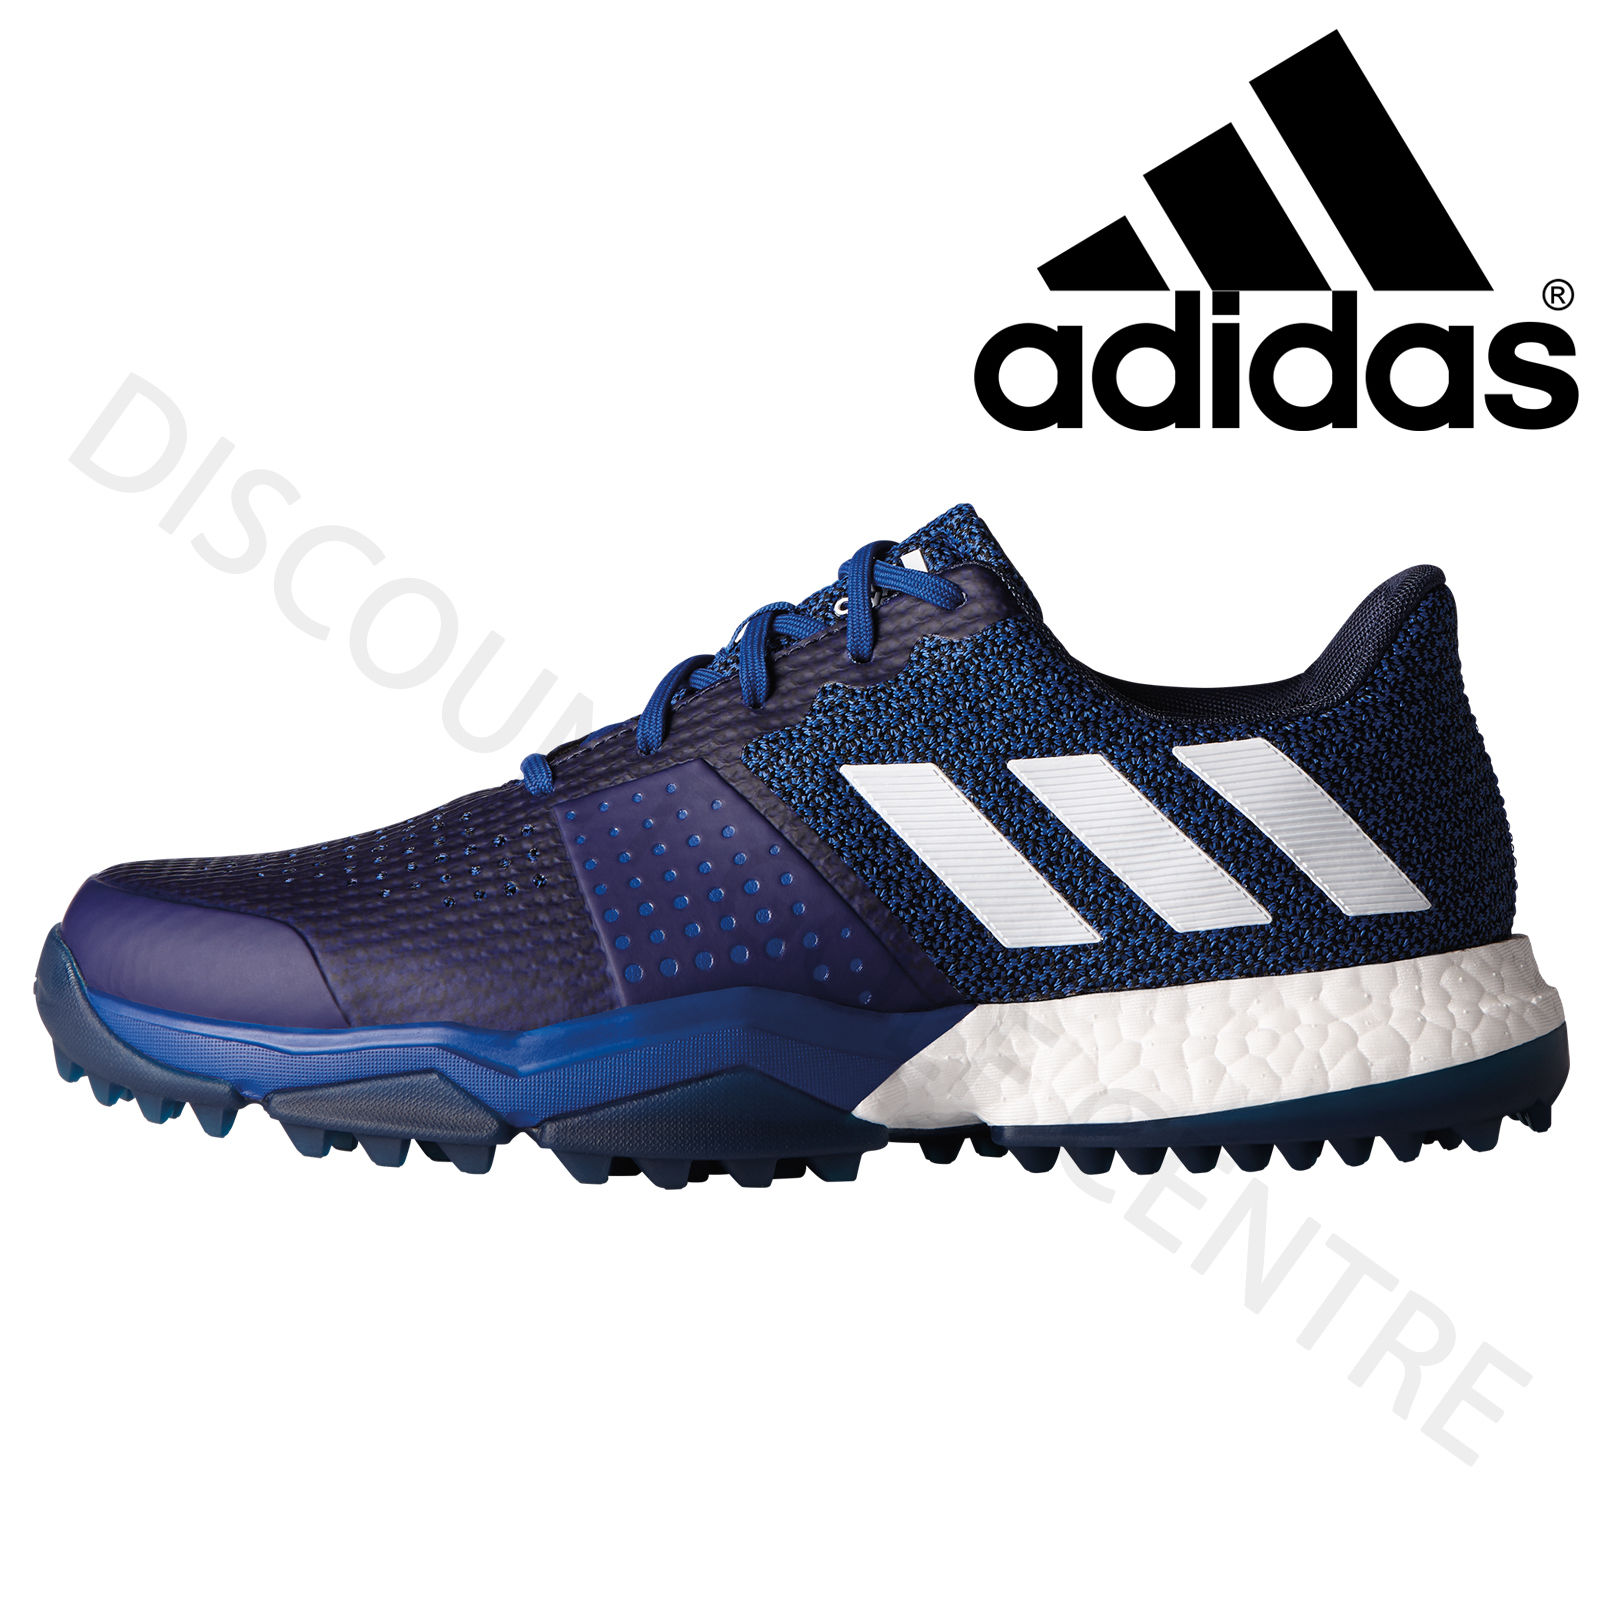 Puma Wide Fit Golf Shoes